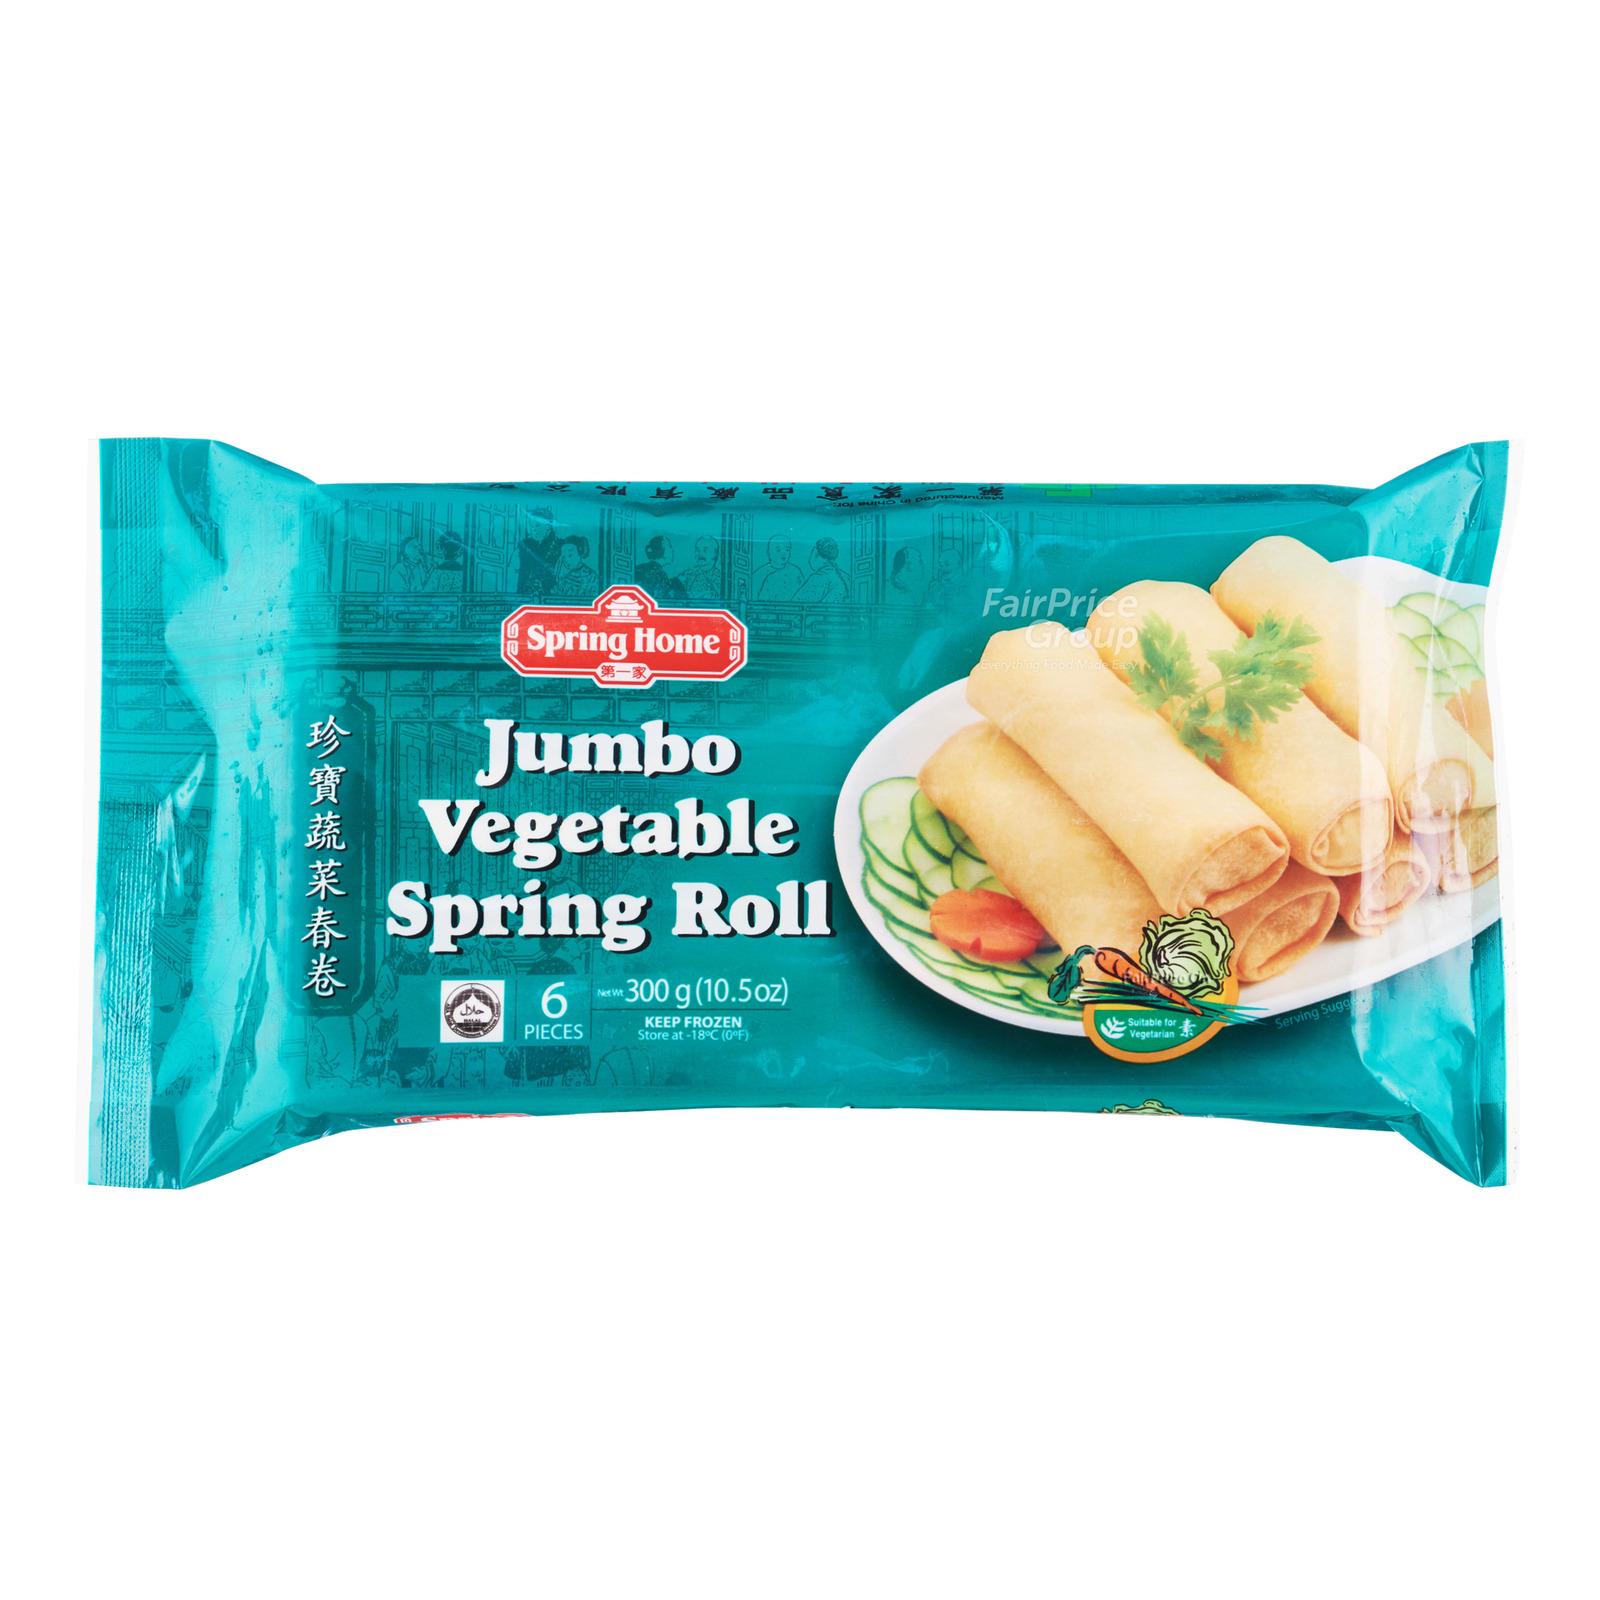 Spring Home Jumbo Spring Roll